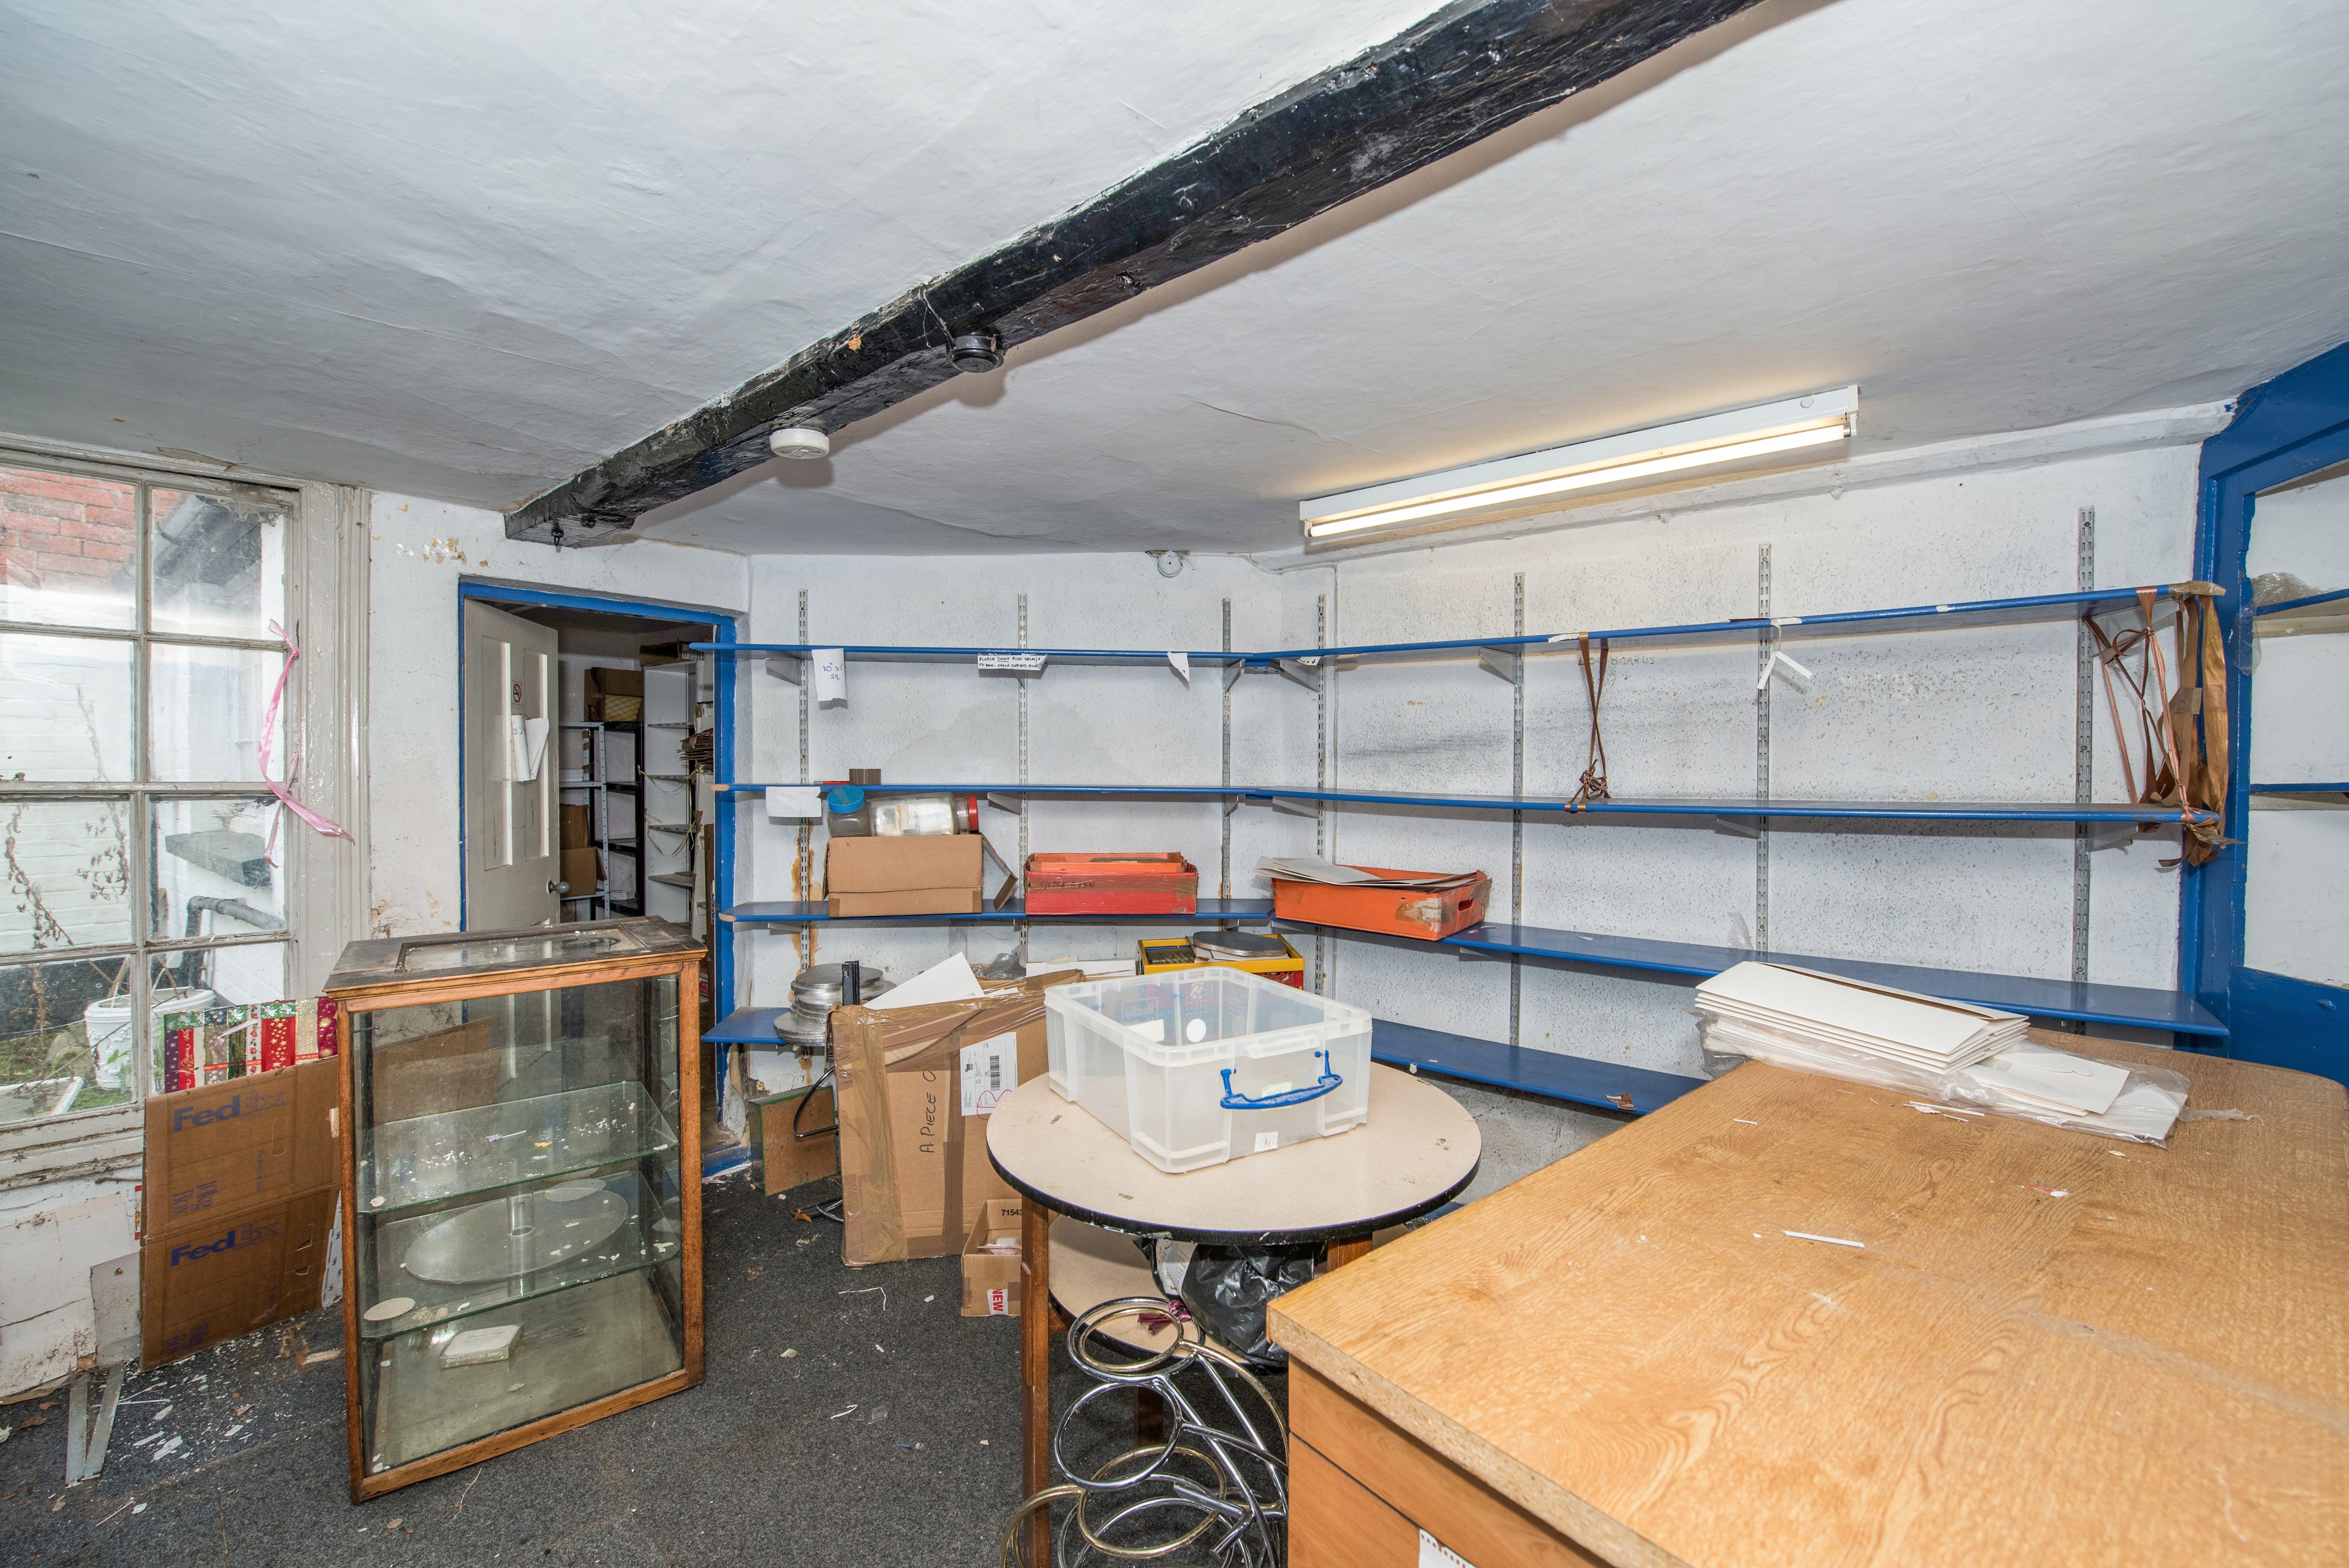 18-20 Upper High Street, Thame, Retail / Residential / Investment For Sale - Fields19.jpg